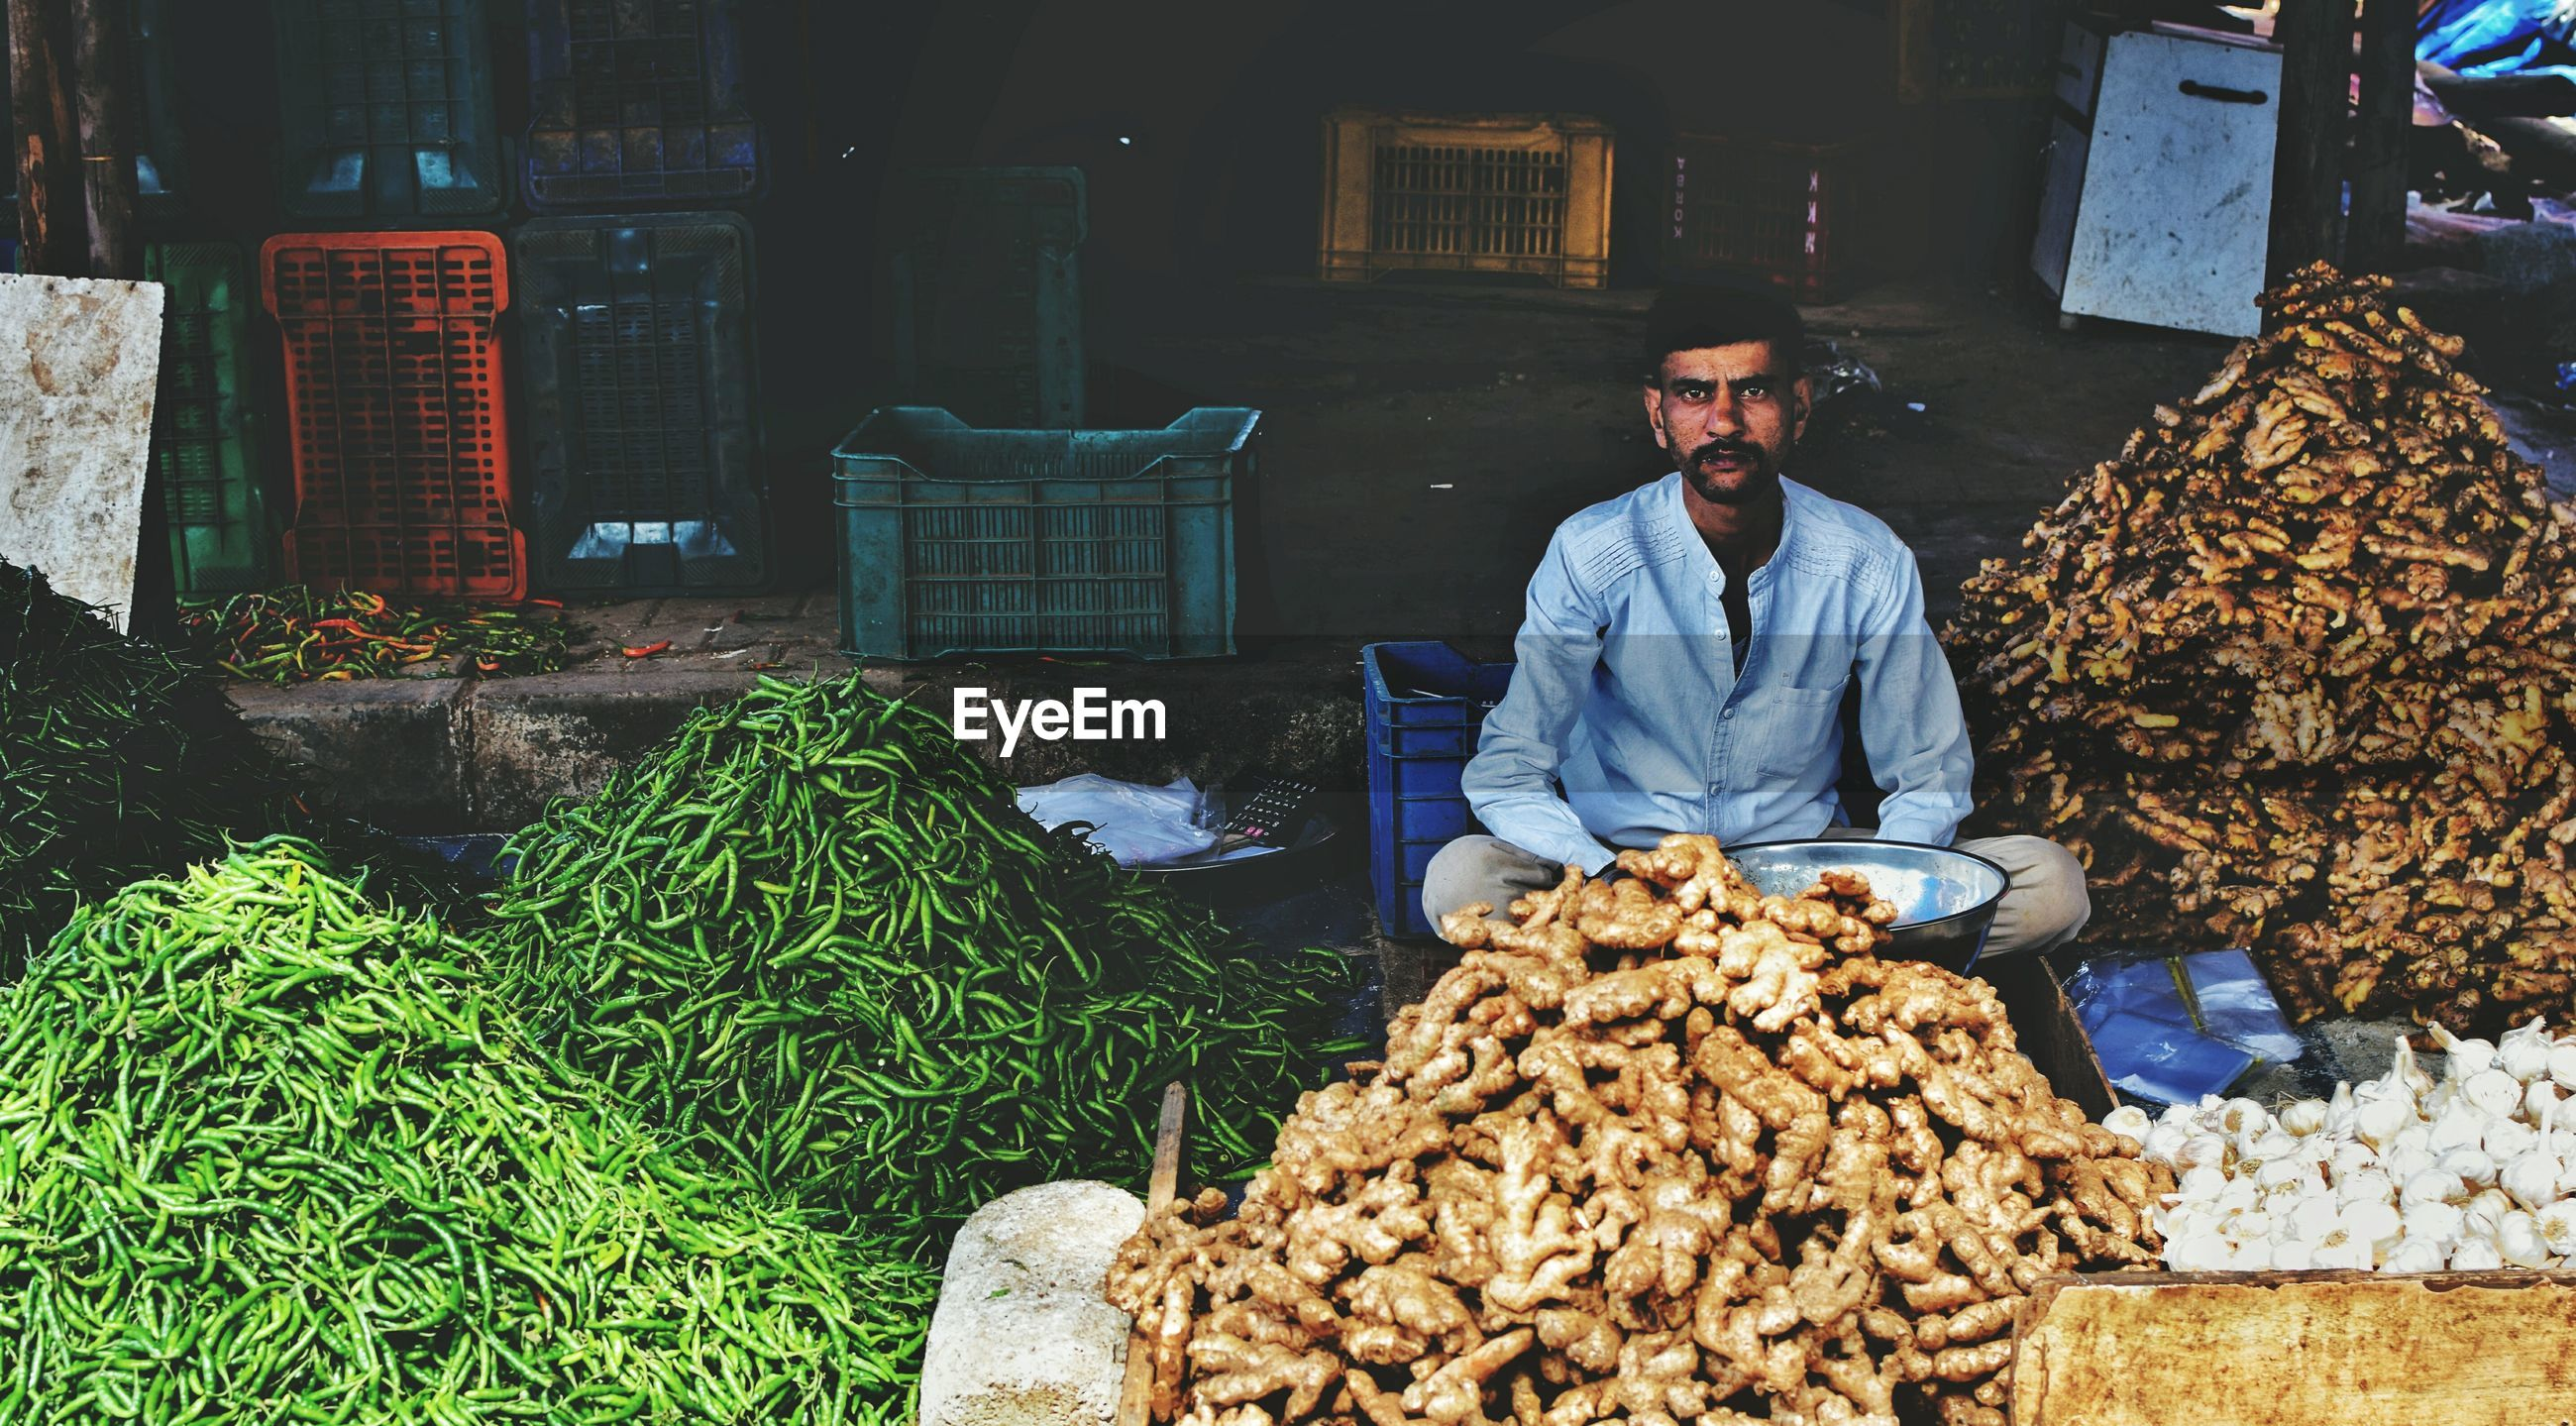 Portrait of vendor with vegetables in market